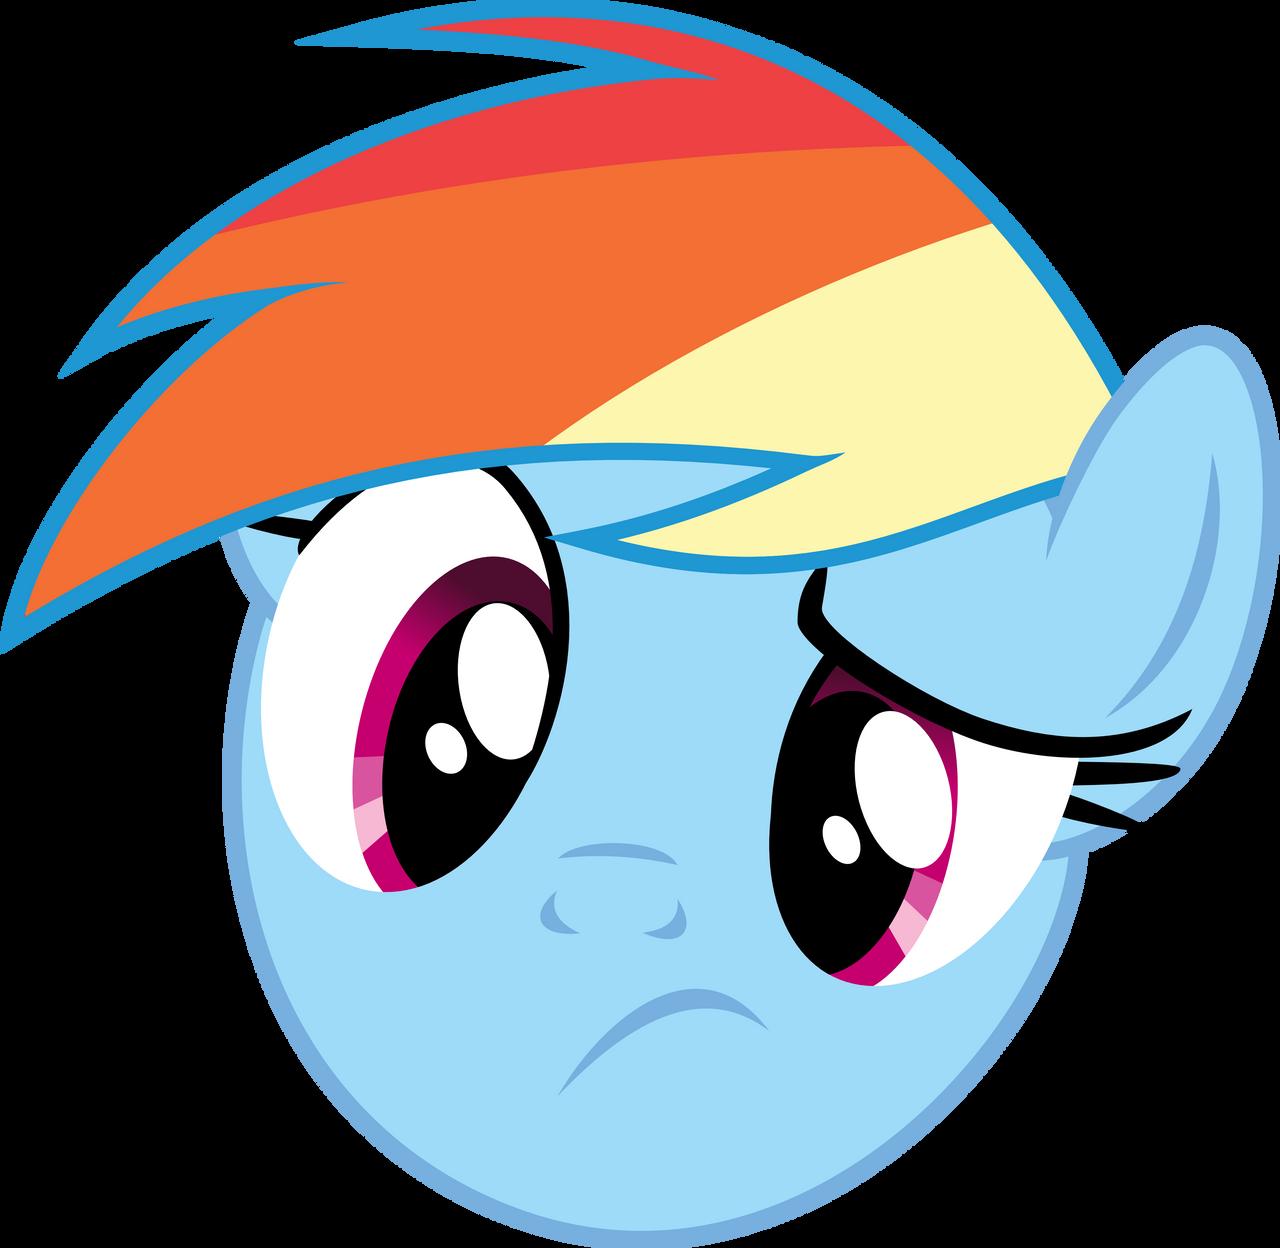 Rainbow Dash Huh By Namelesshero2222 On Deviantart